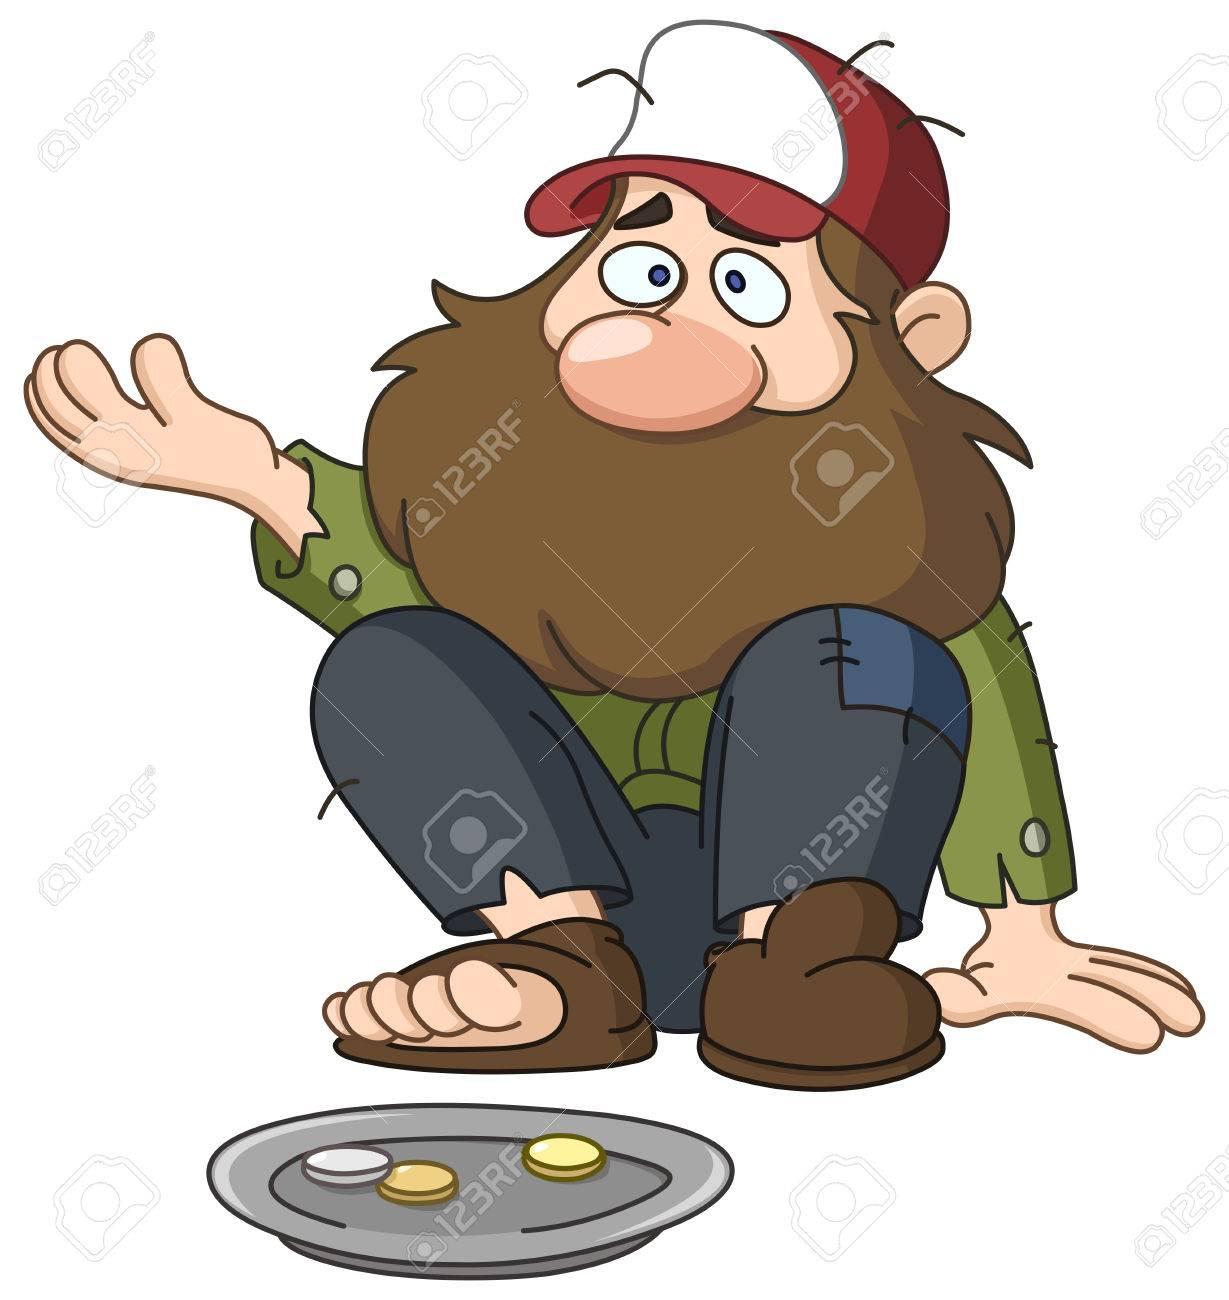 homeless beggar royalty free cliparts vectors and stock rh 123rf com homeless shelter clipart homeless clip ks2